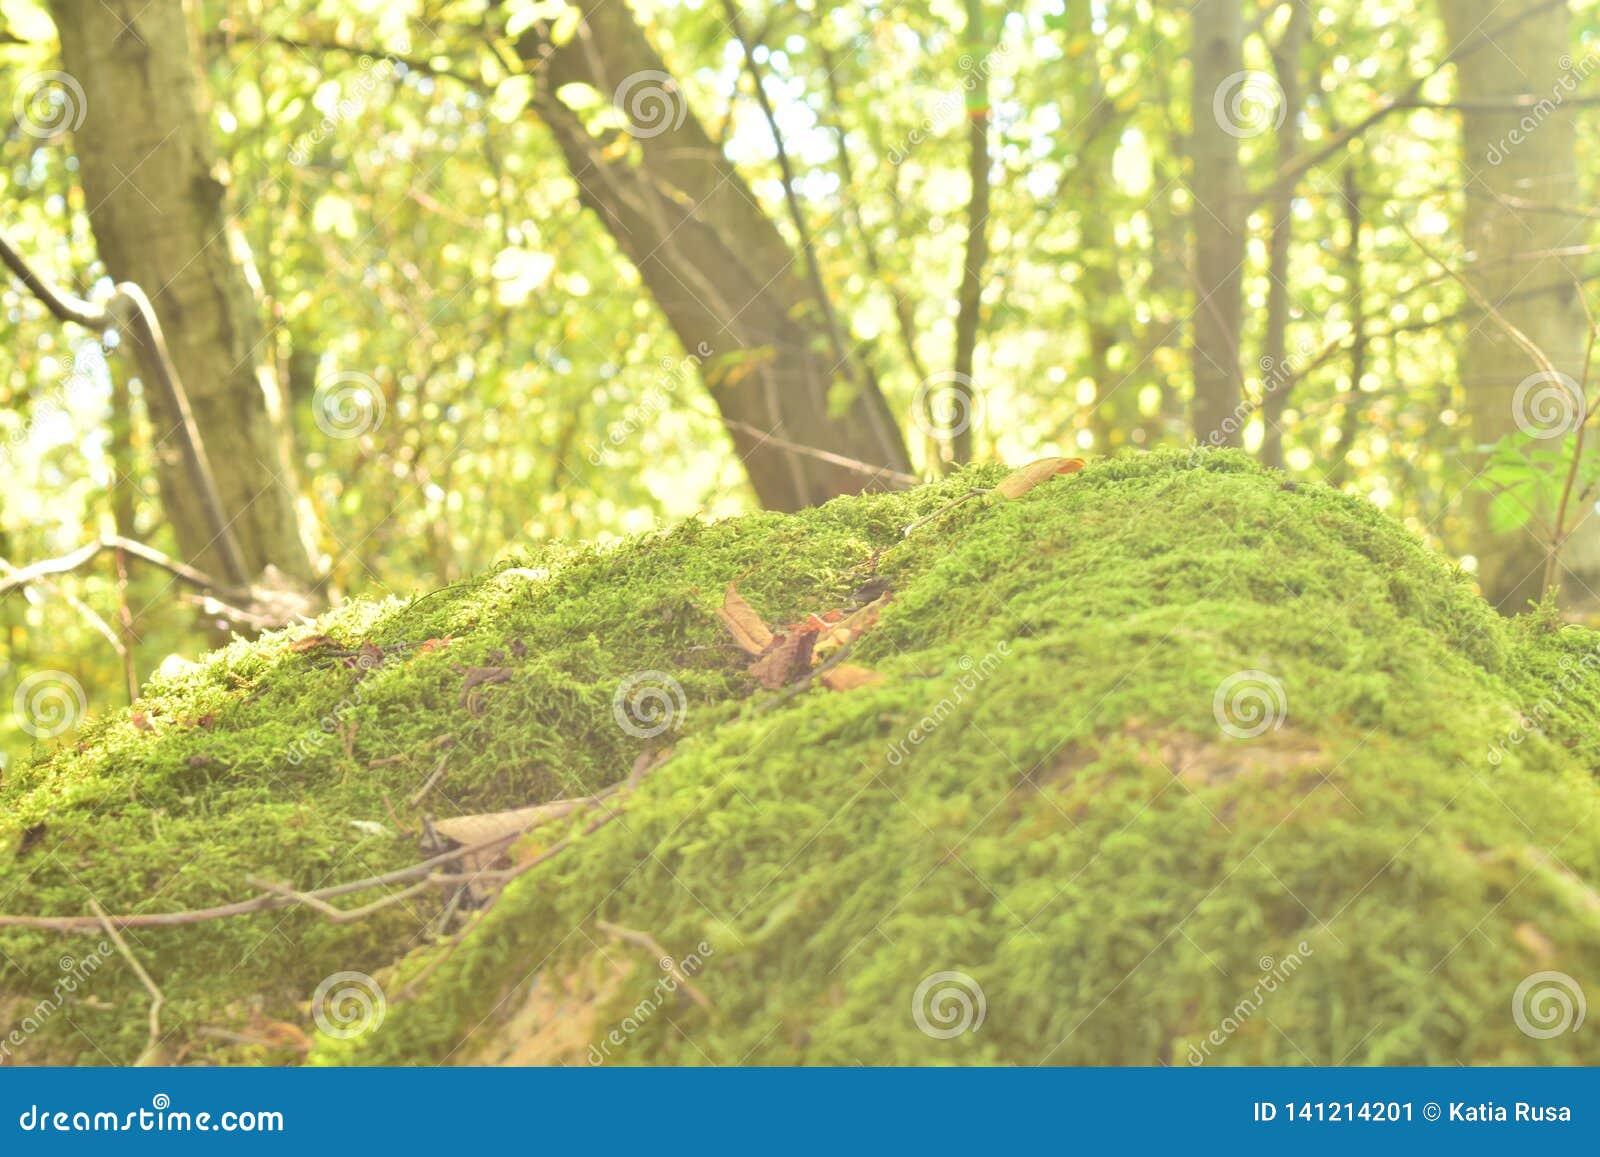 Grasartiger Hügel im Wald